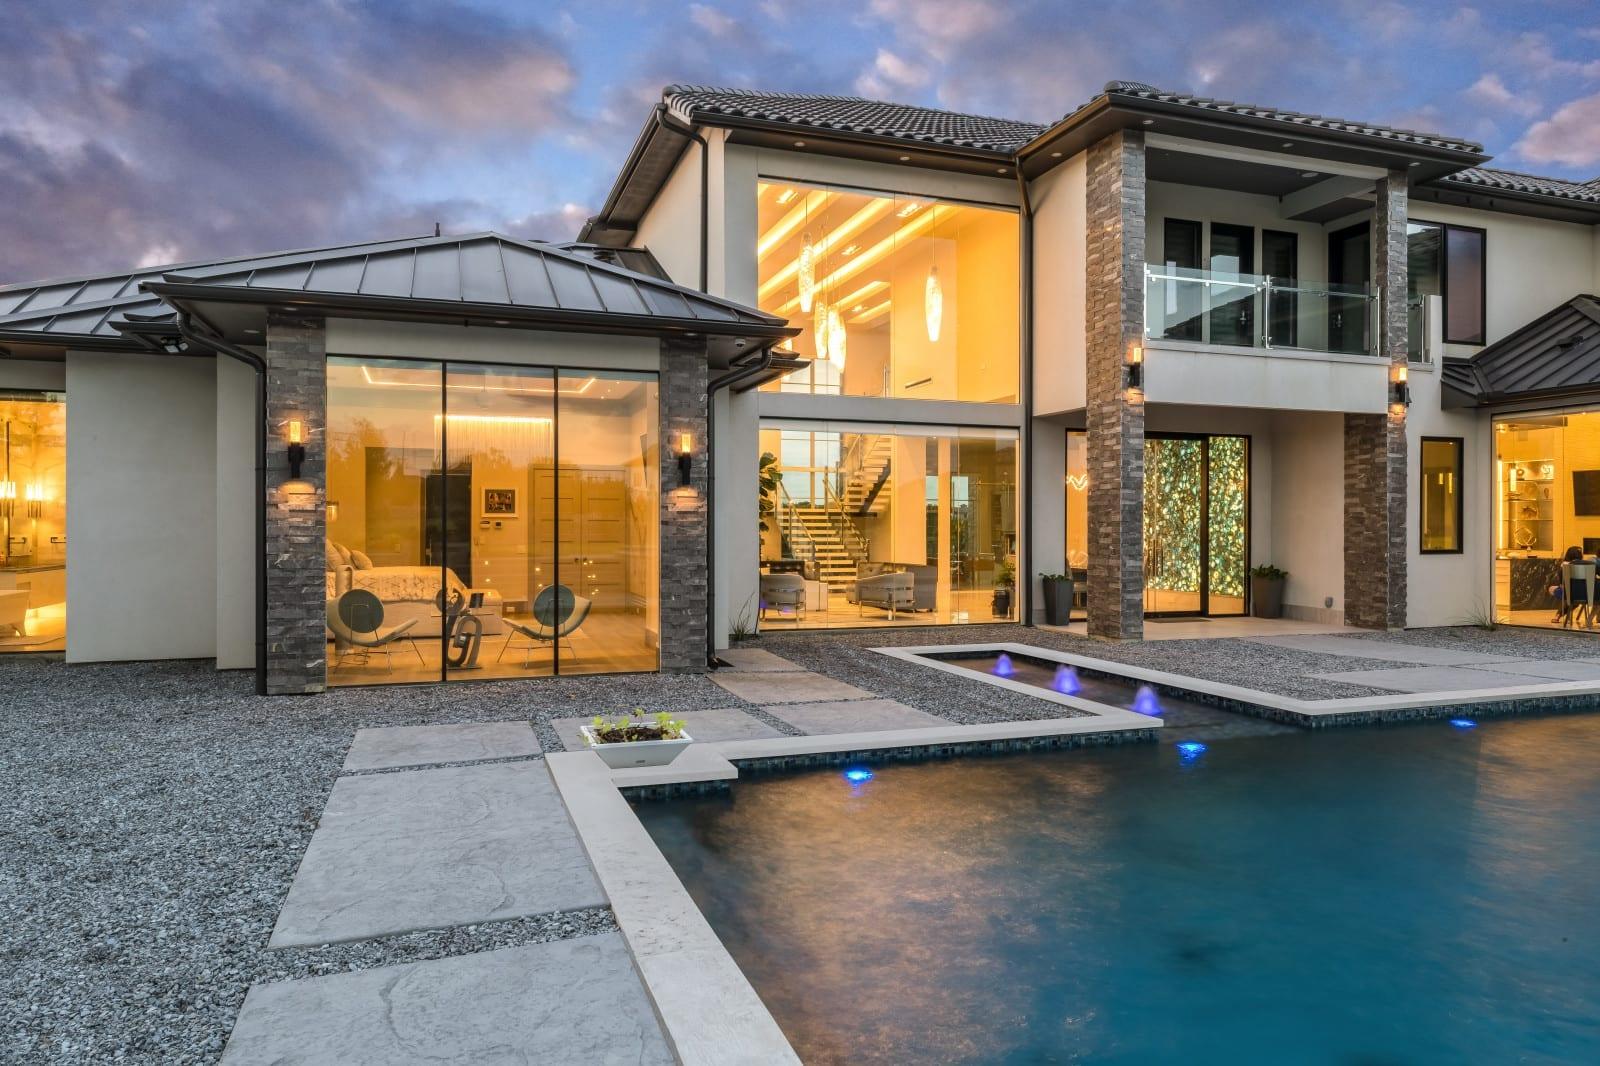 Modern luxury Home Build # 44 - By Millennial Design + Build, modern Home Builders in Frisco Texas, modern style homes, and modern home builders in Frisco